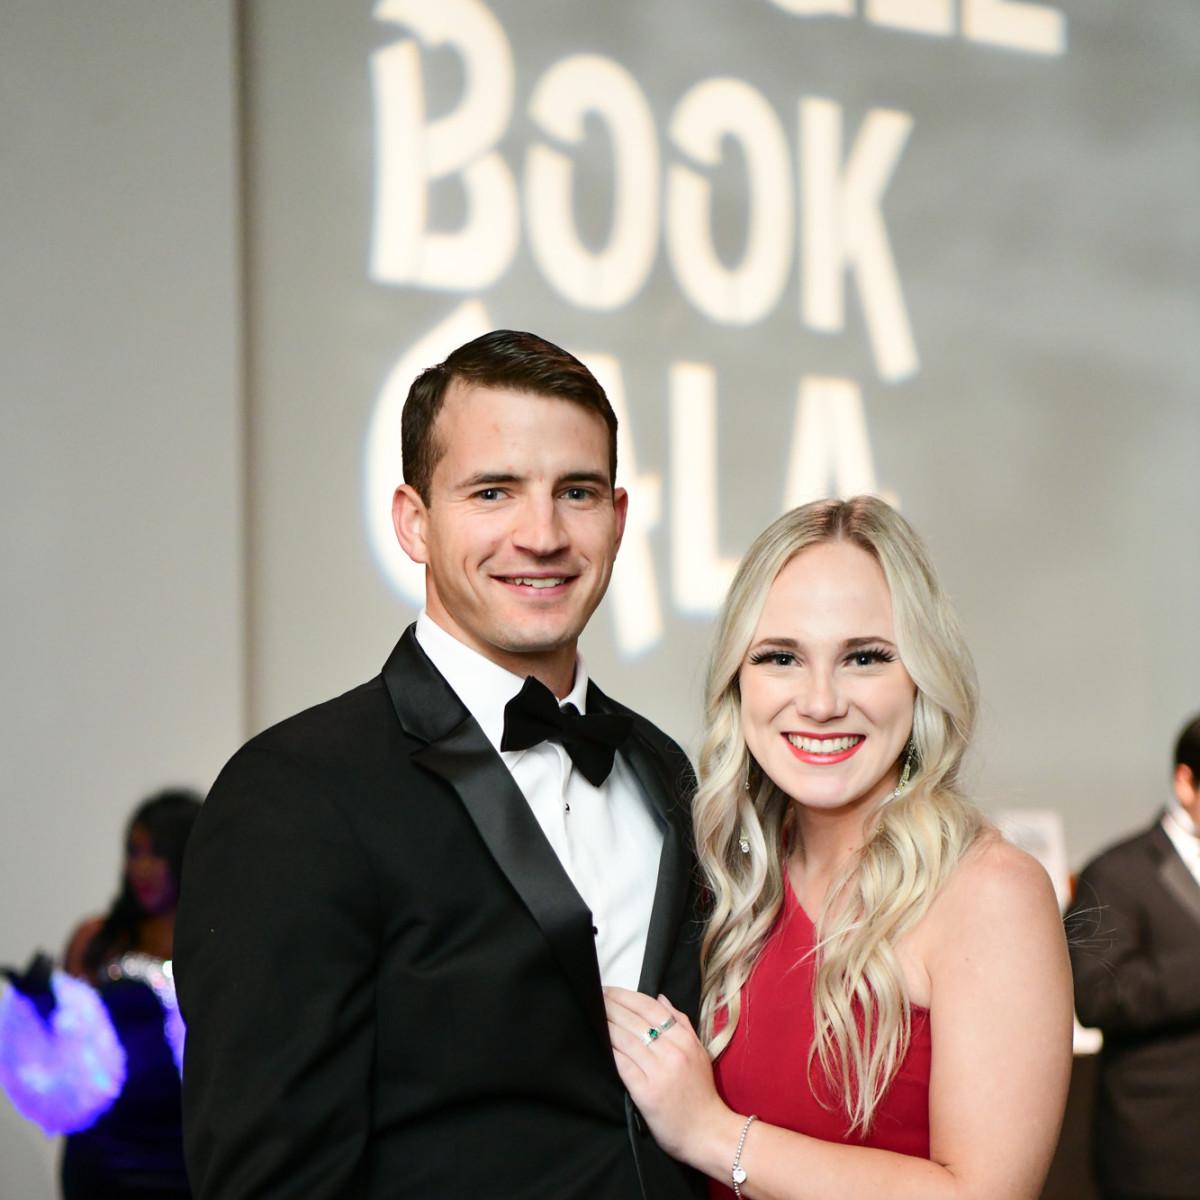 Jungle Book Gala 2019 Clark Fiedler and Peyton Maddox